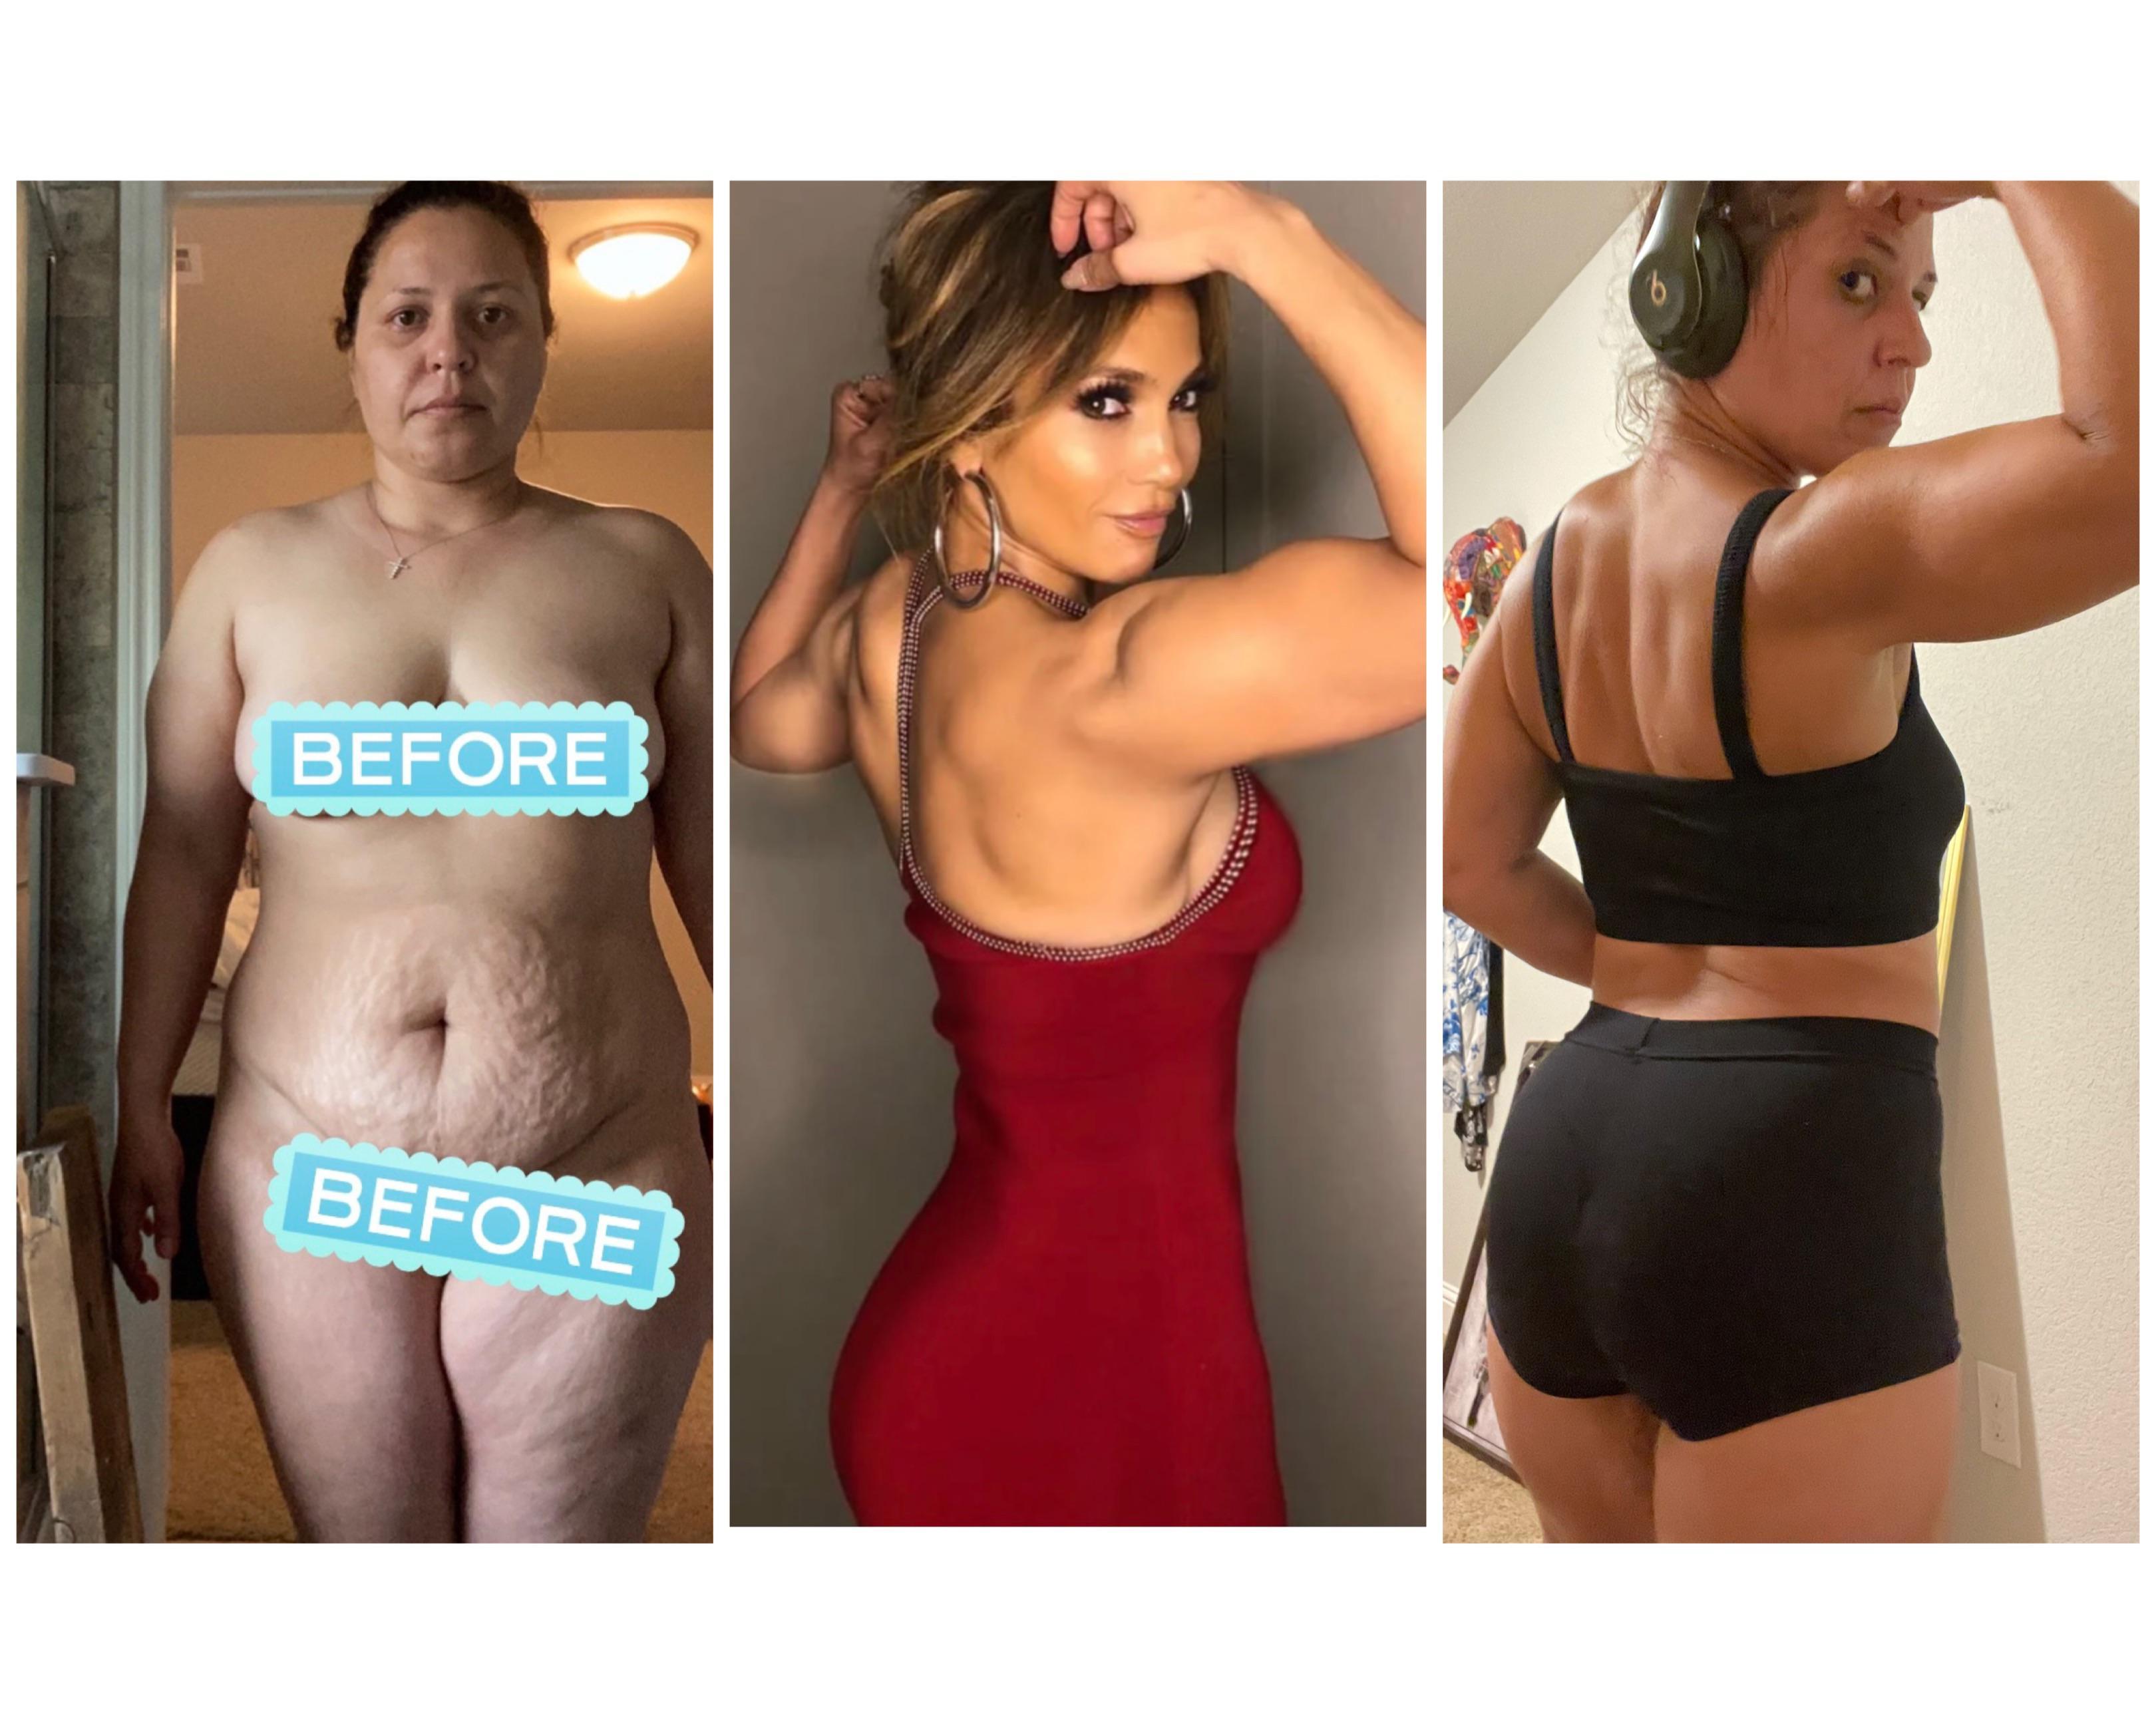 5 feet 2 Female Progress Pics of 87 lbs Weight Loss 192 lbs to 105 lbs